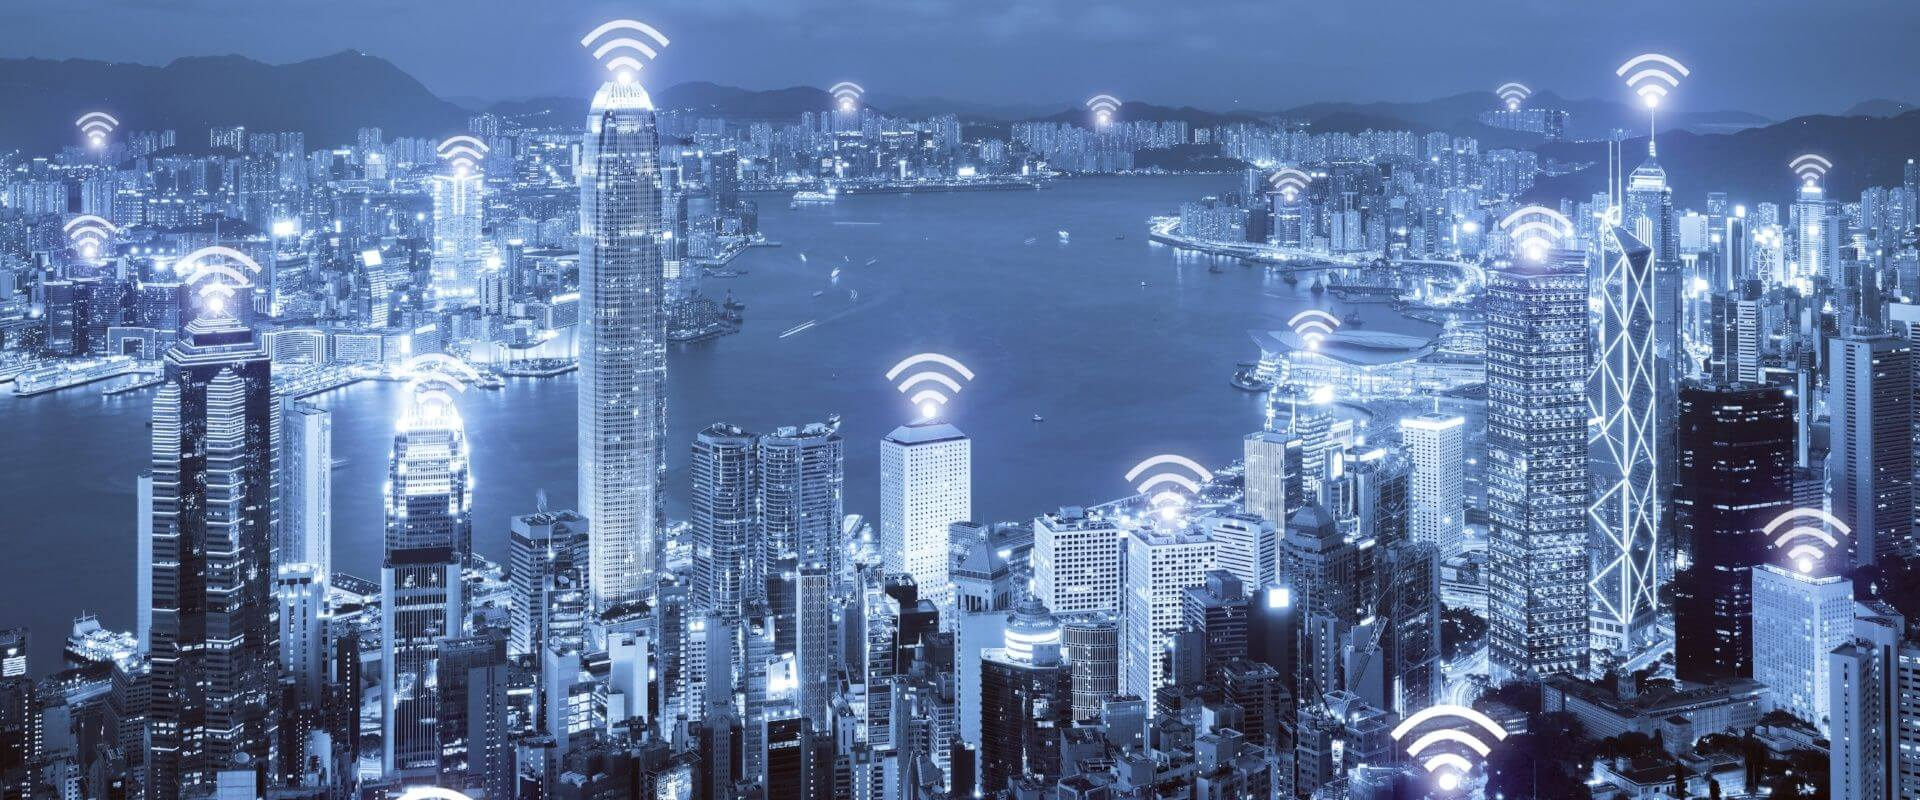 hong-kong-lpwa-network-banner.jpg